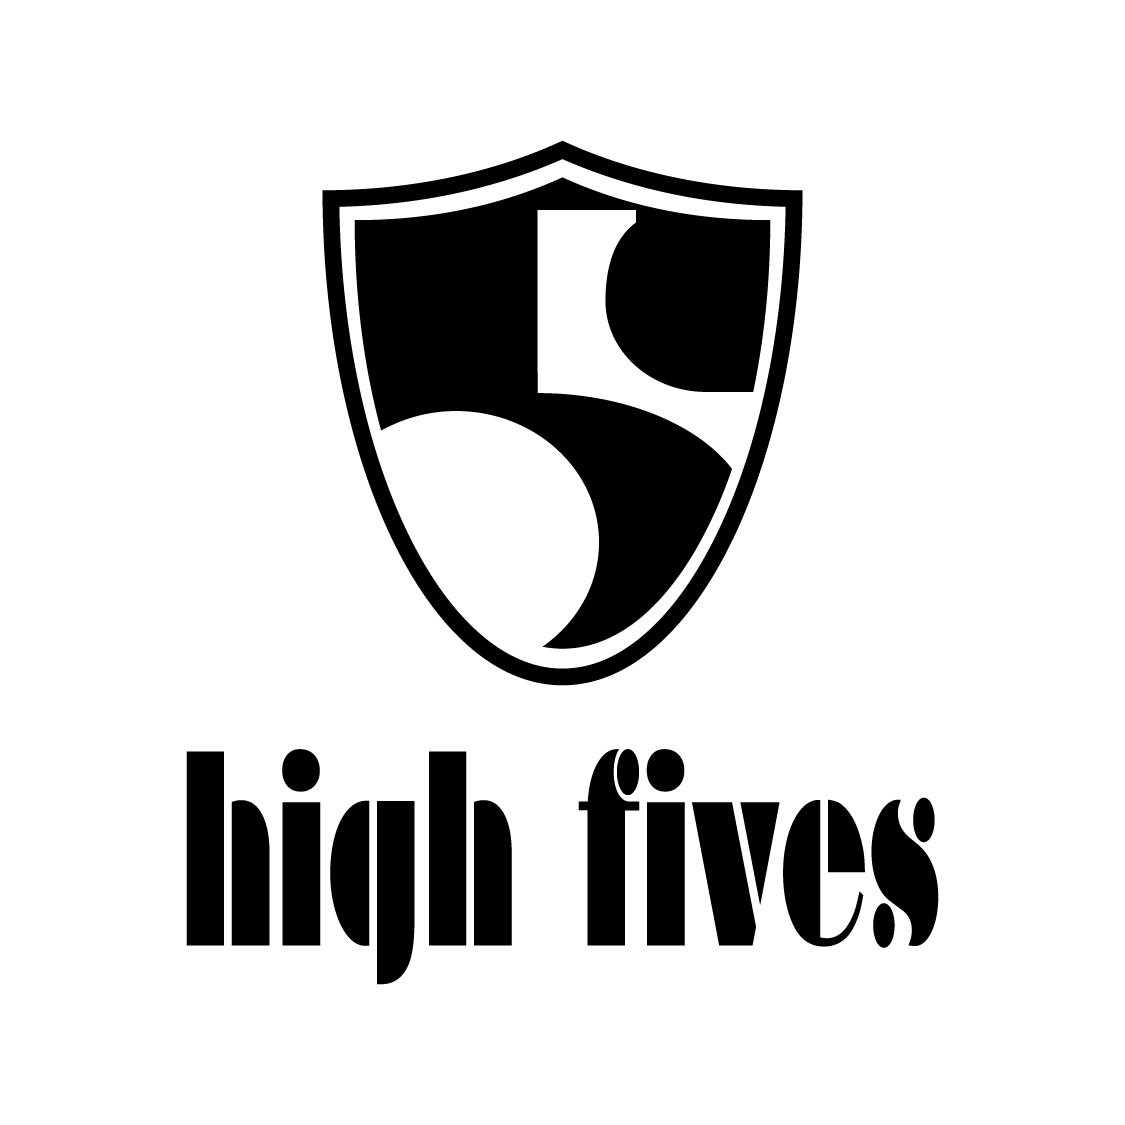 HighFives.jpg